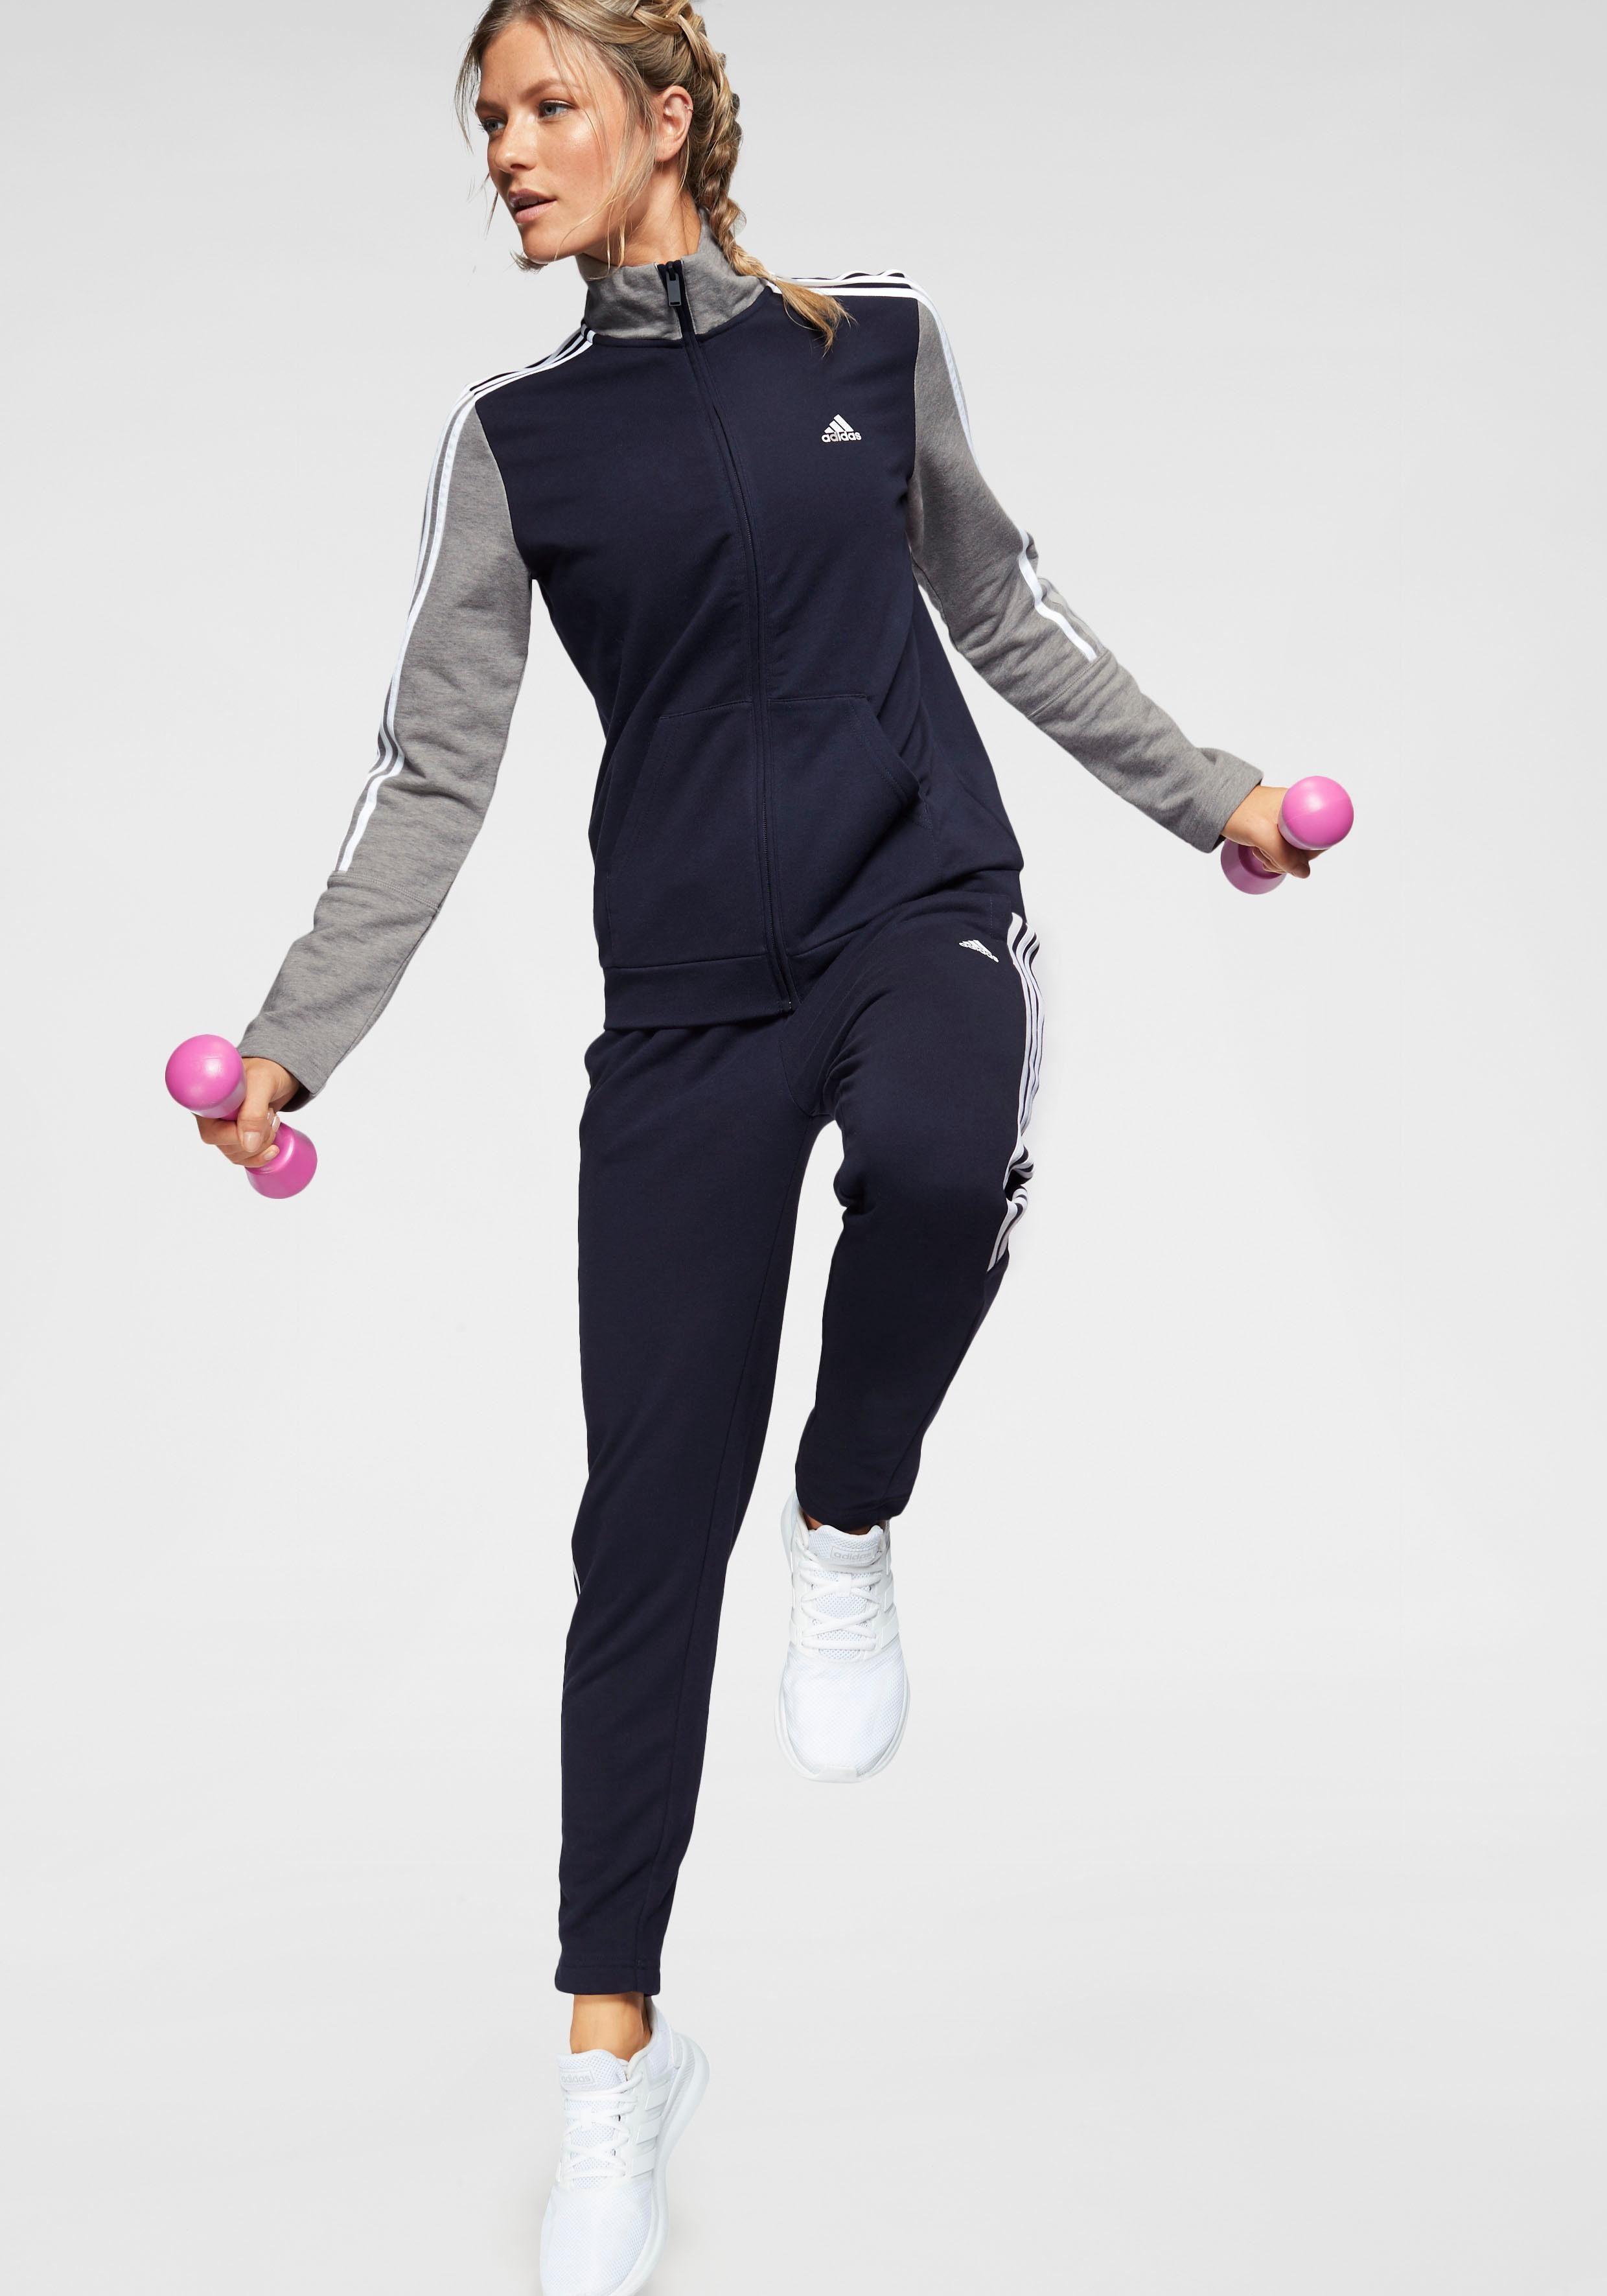 adidas performance jogginganzug